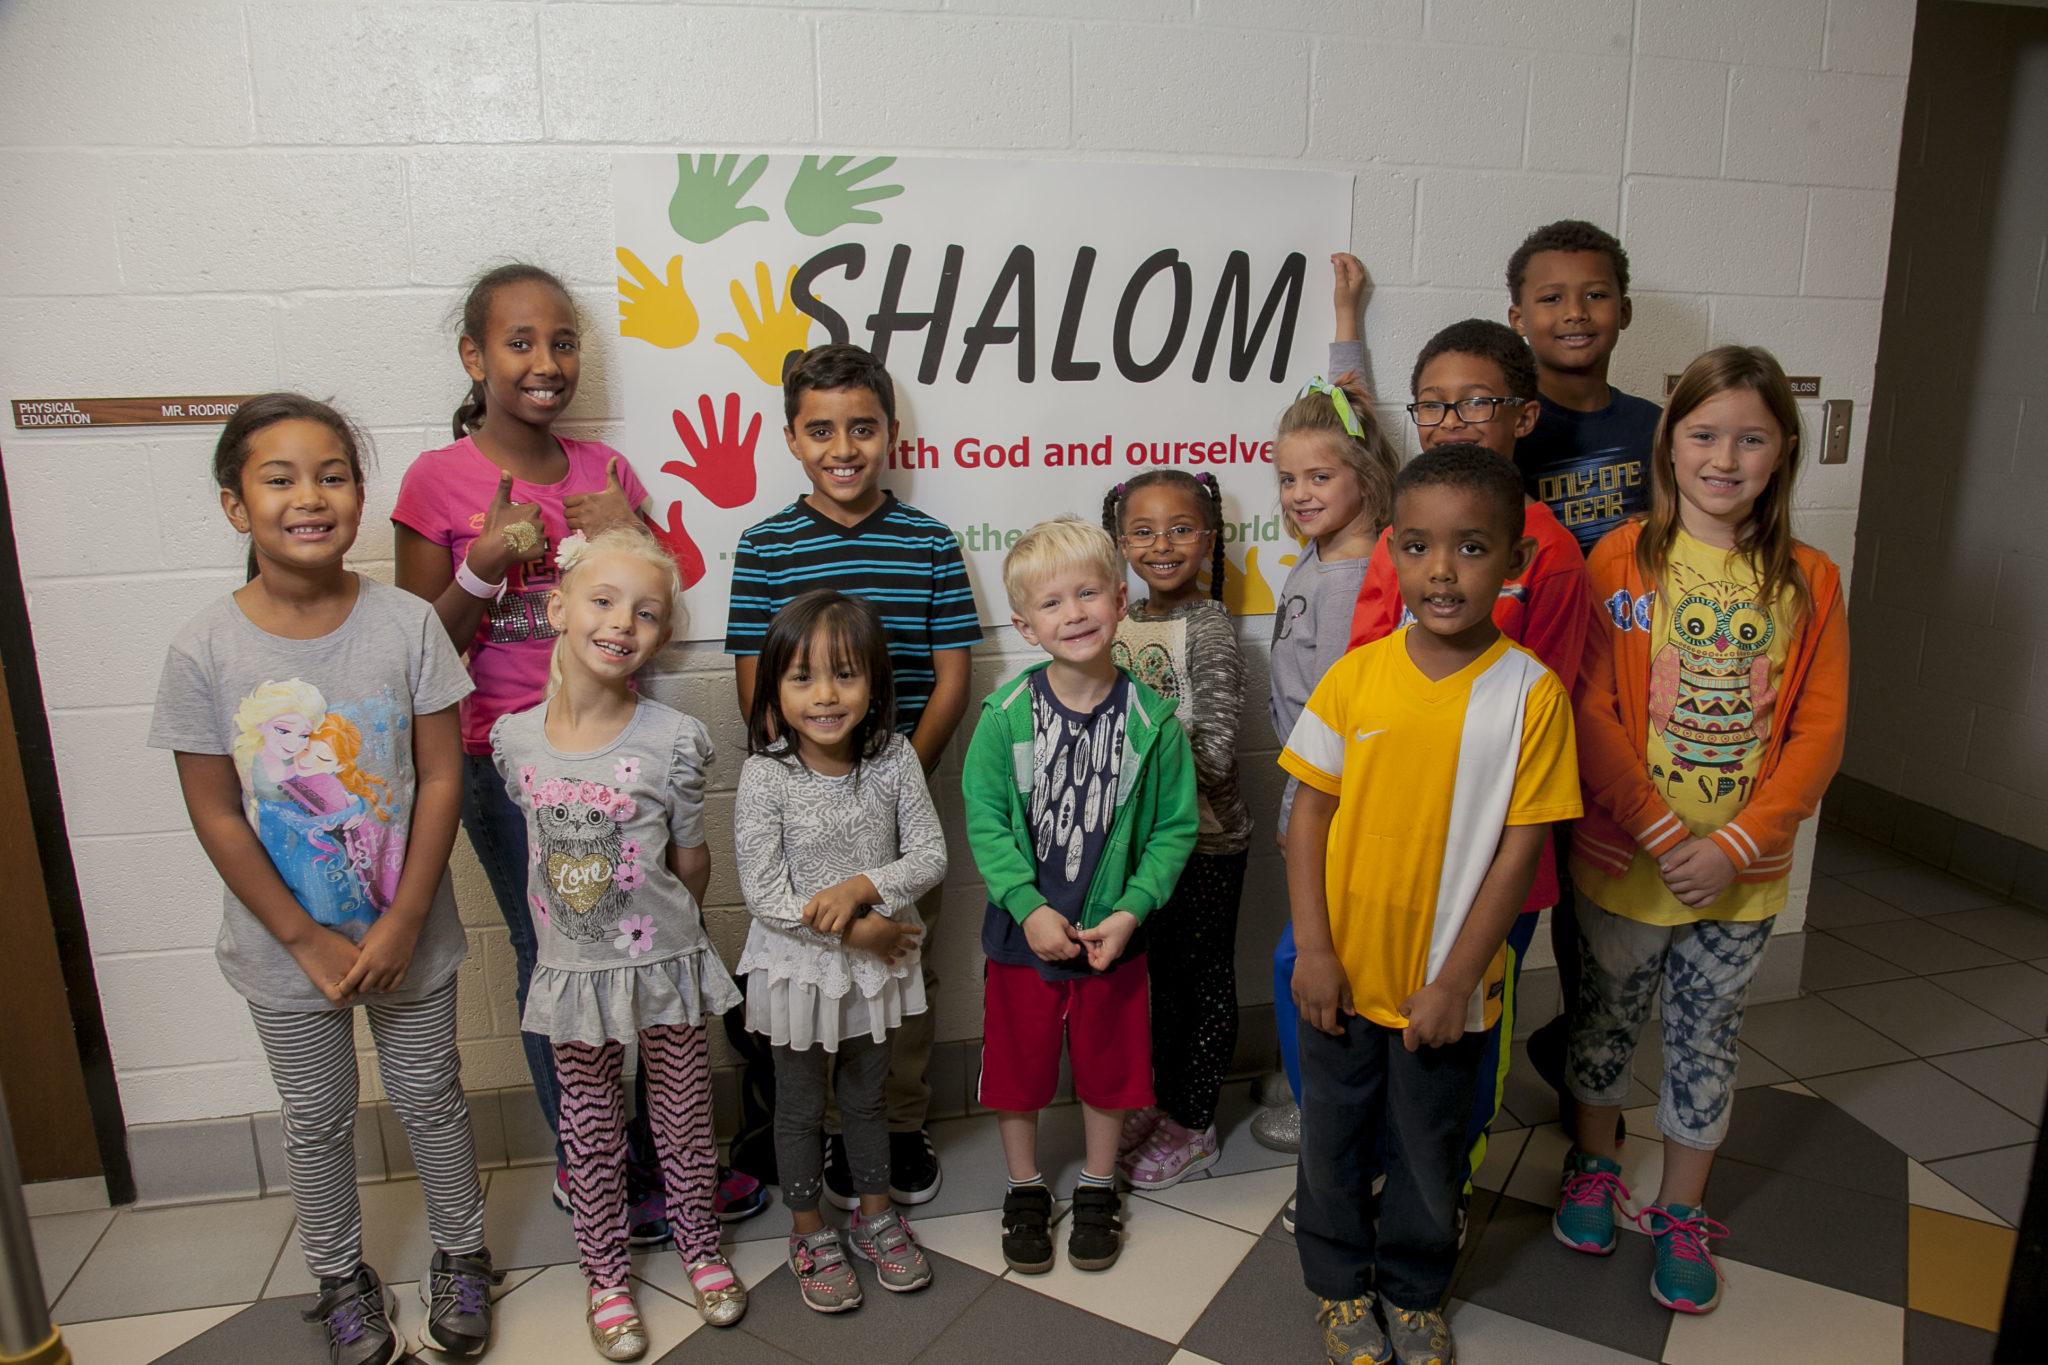 ND group shalom